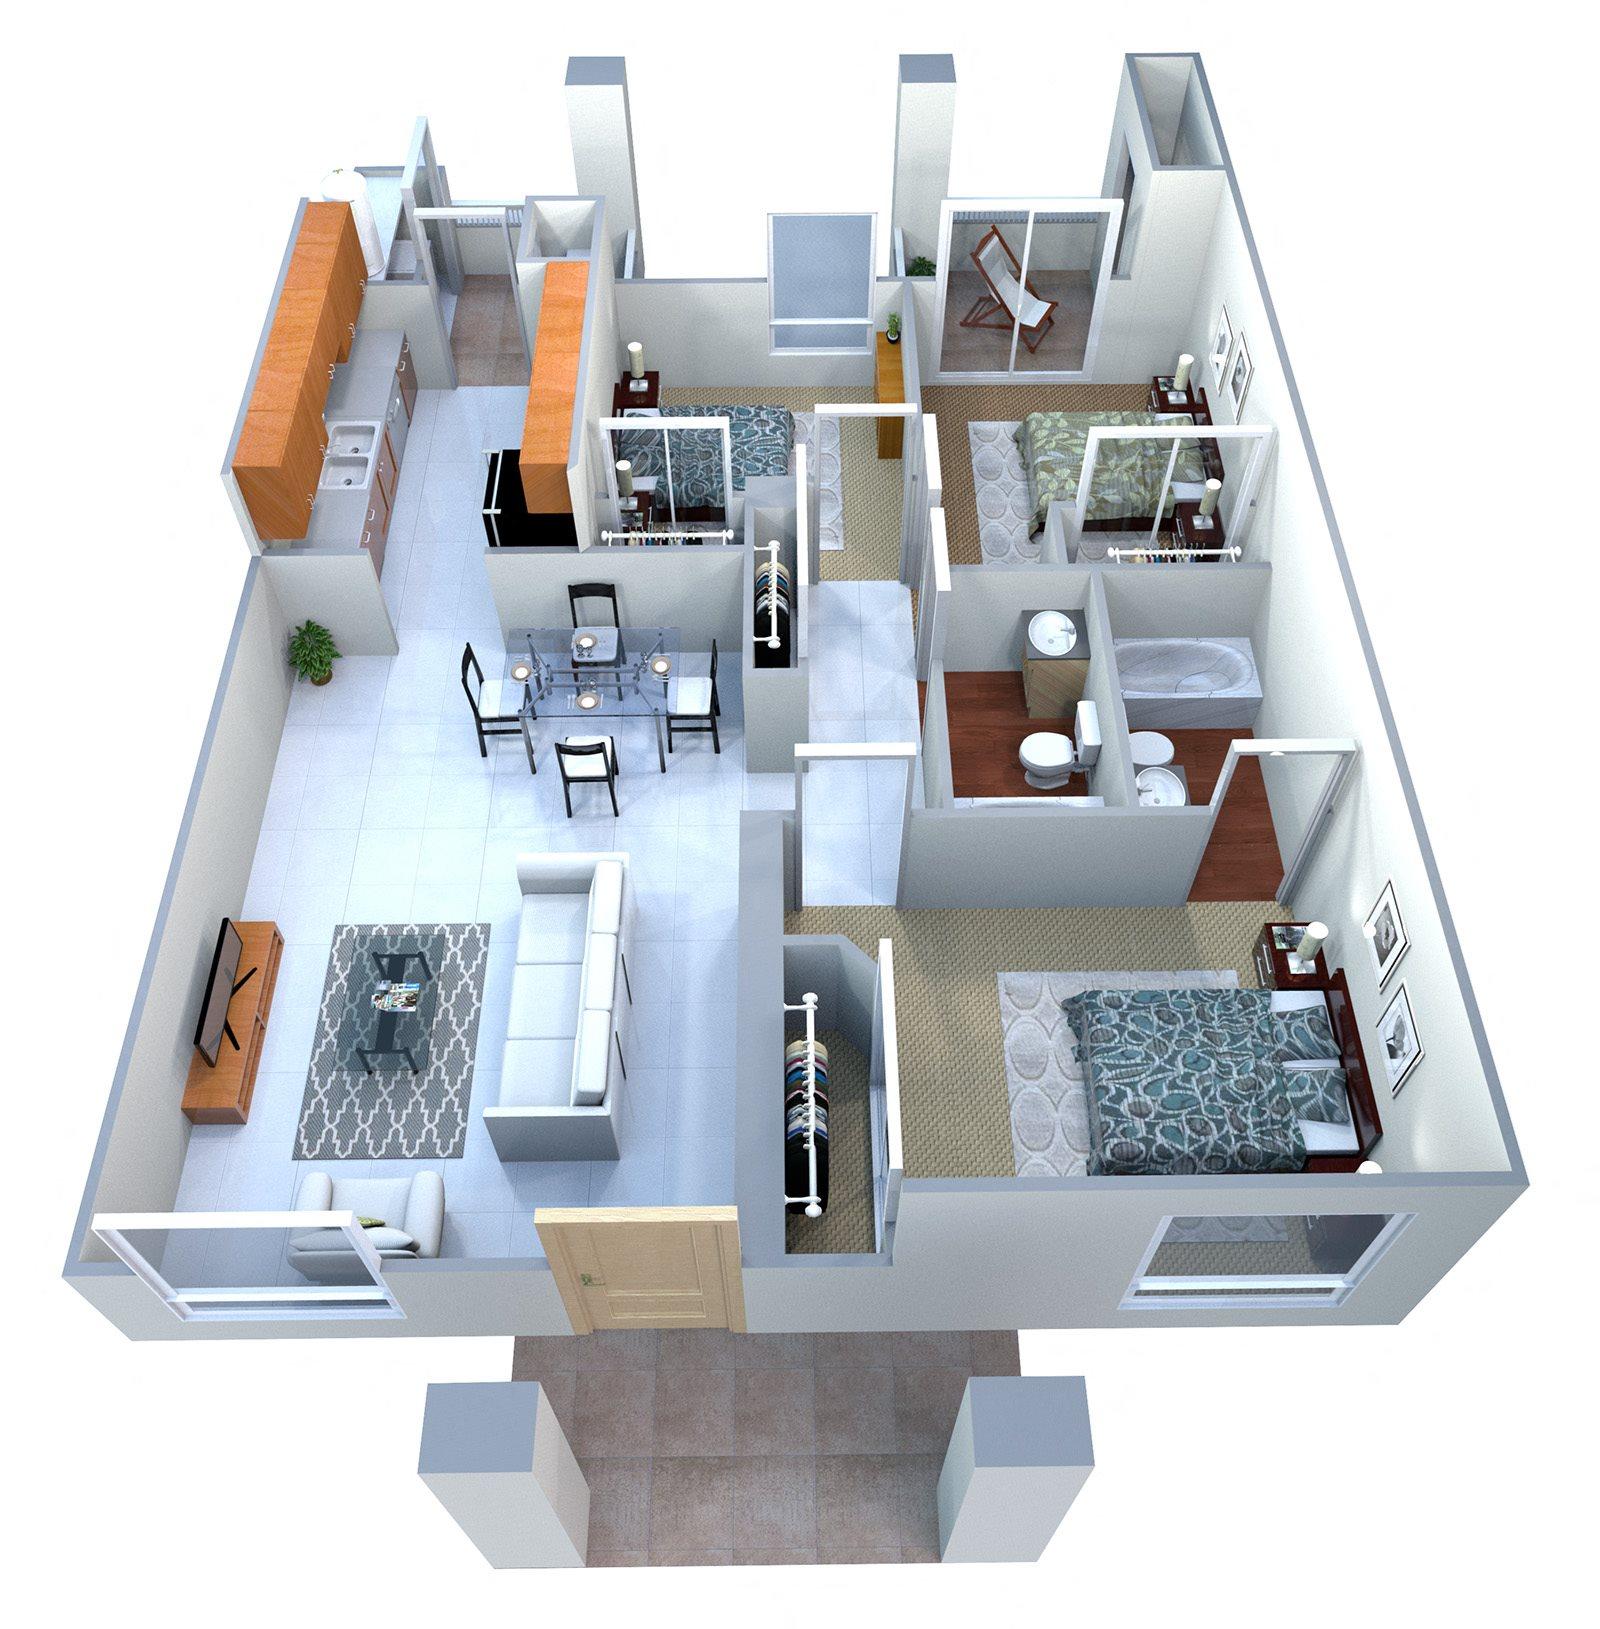 Floor Plans Of San Angelin Apartments In Mesa, AZ